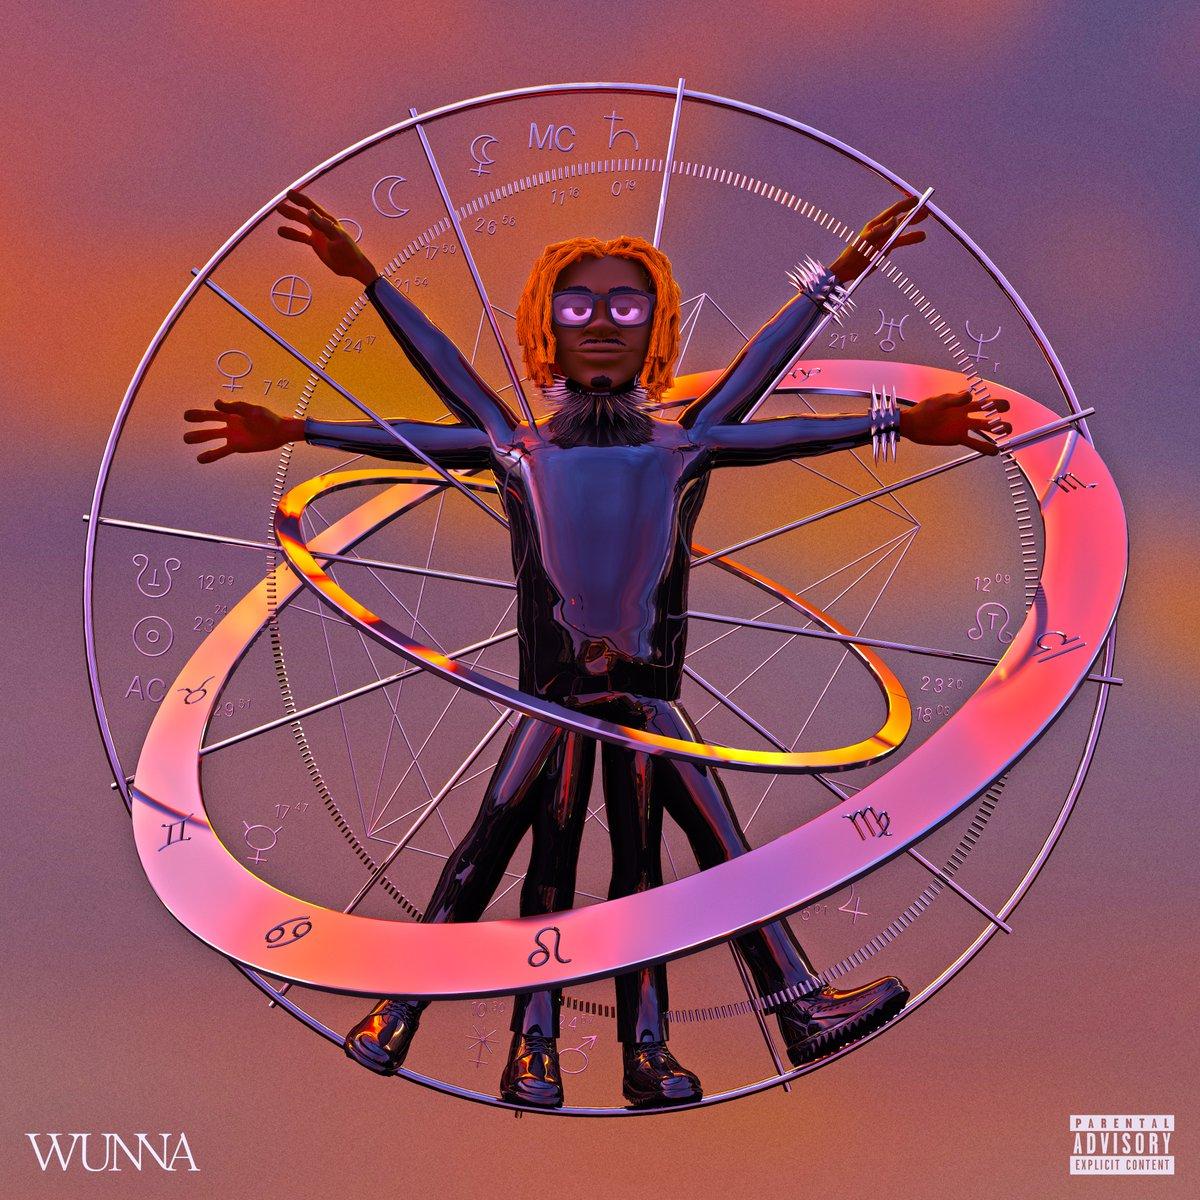 #WUNNA #WUNNAALBUM ♊️🐍 OUT NOW wunna.ffm.to/album